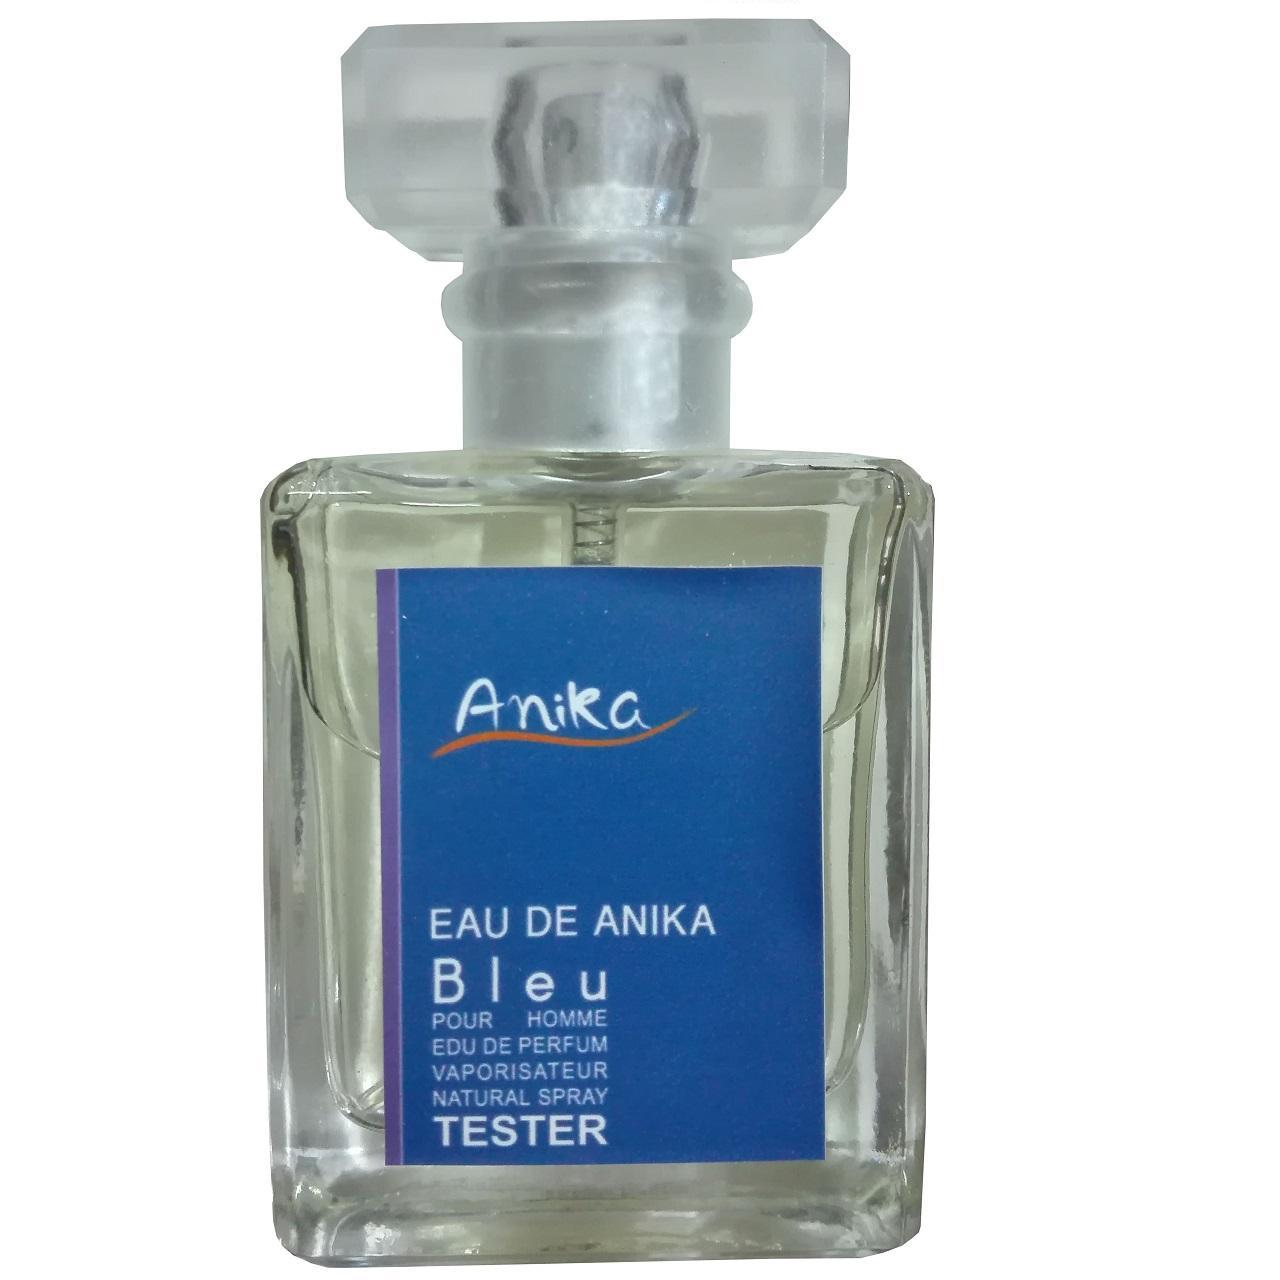 تستر عطر جیبی مردانه آنیکا مدل Bleu حجم 30 میلی لیتر